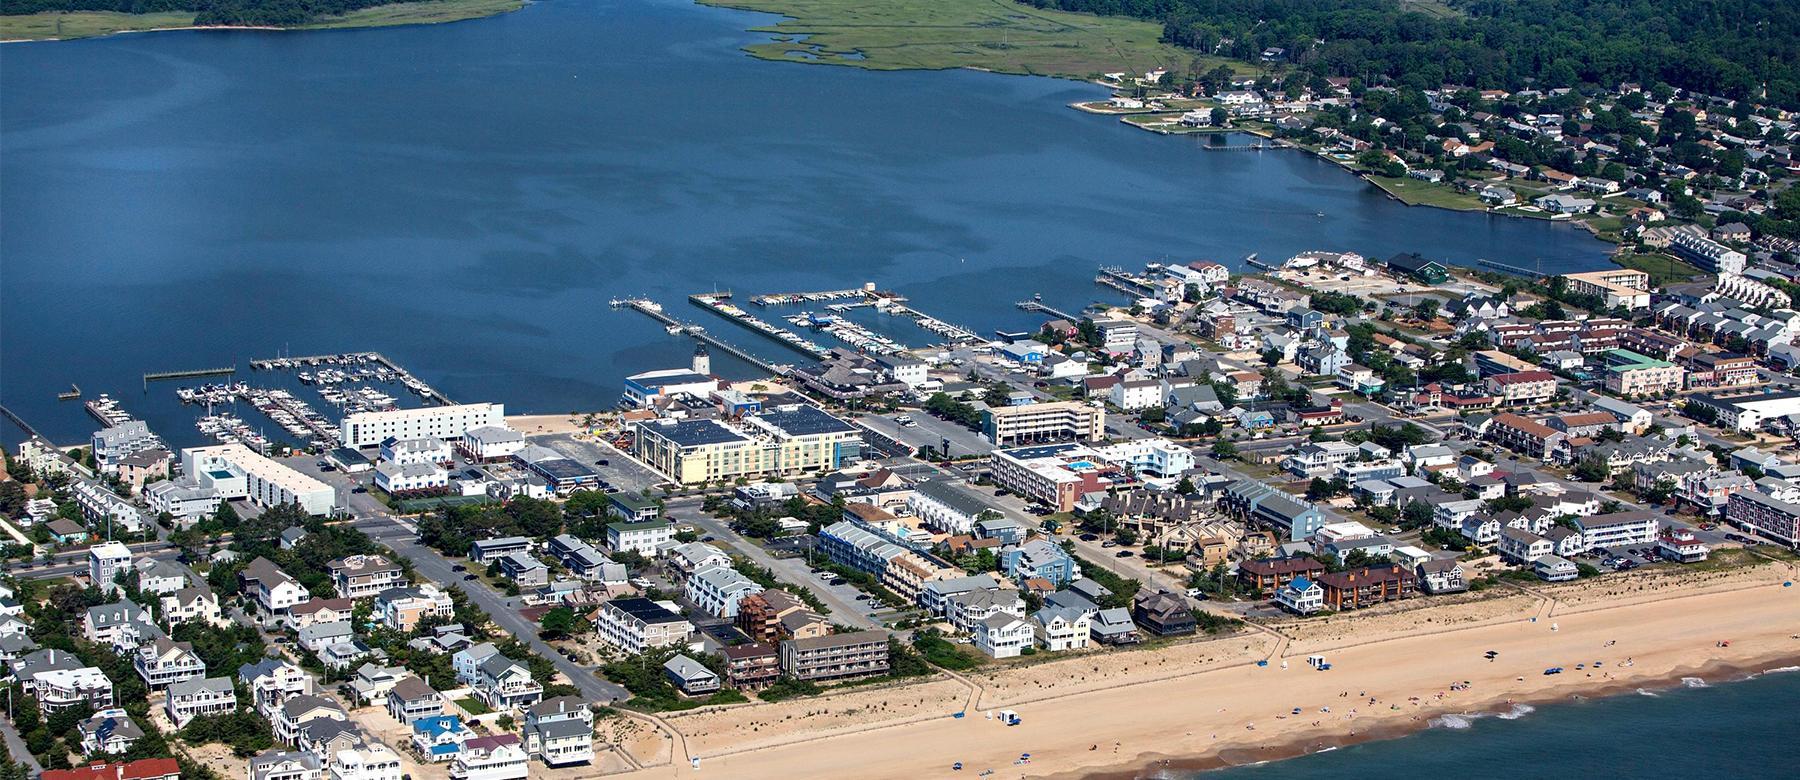 Town Of Dewey Beach Delaware